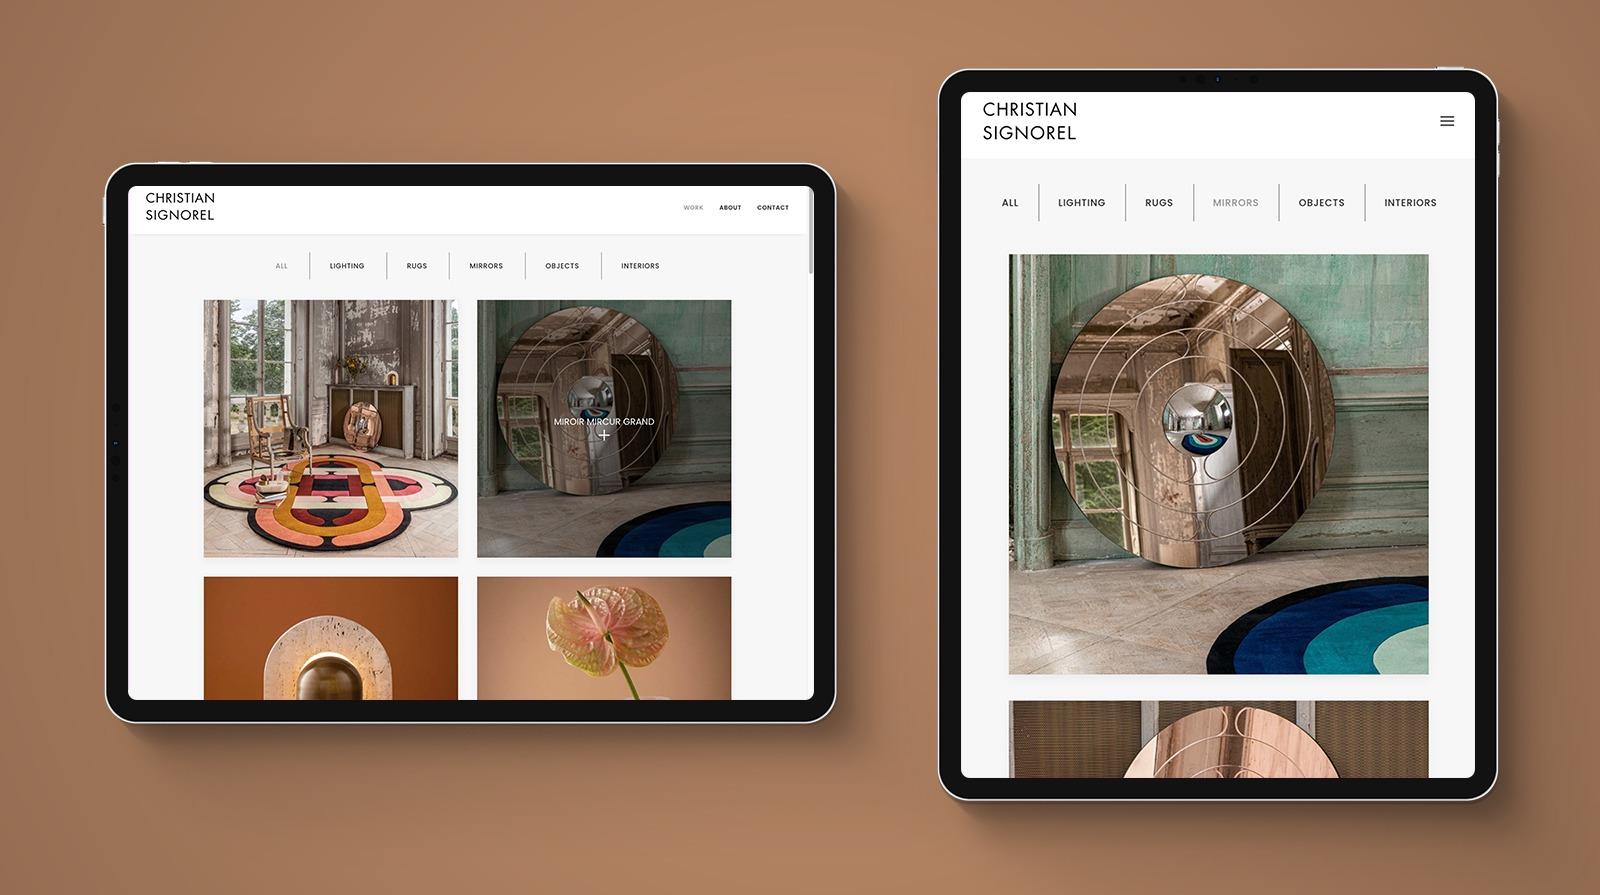 christiansignorel ipad - Design by CS